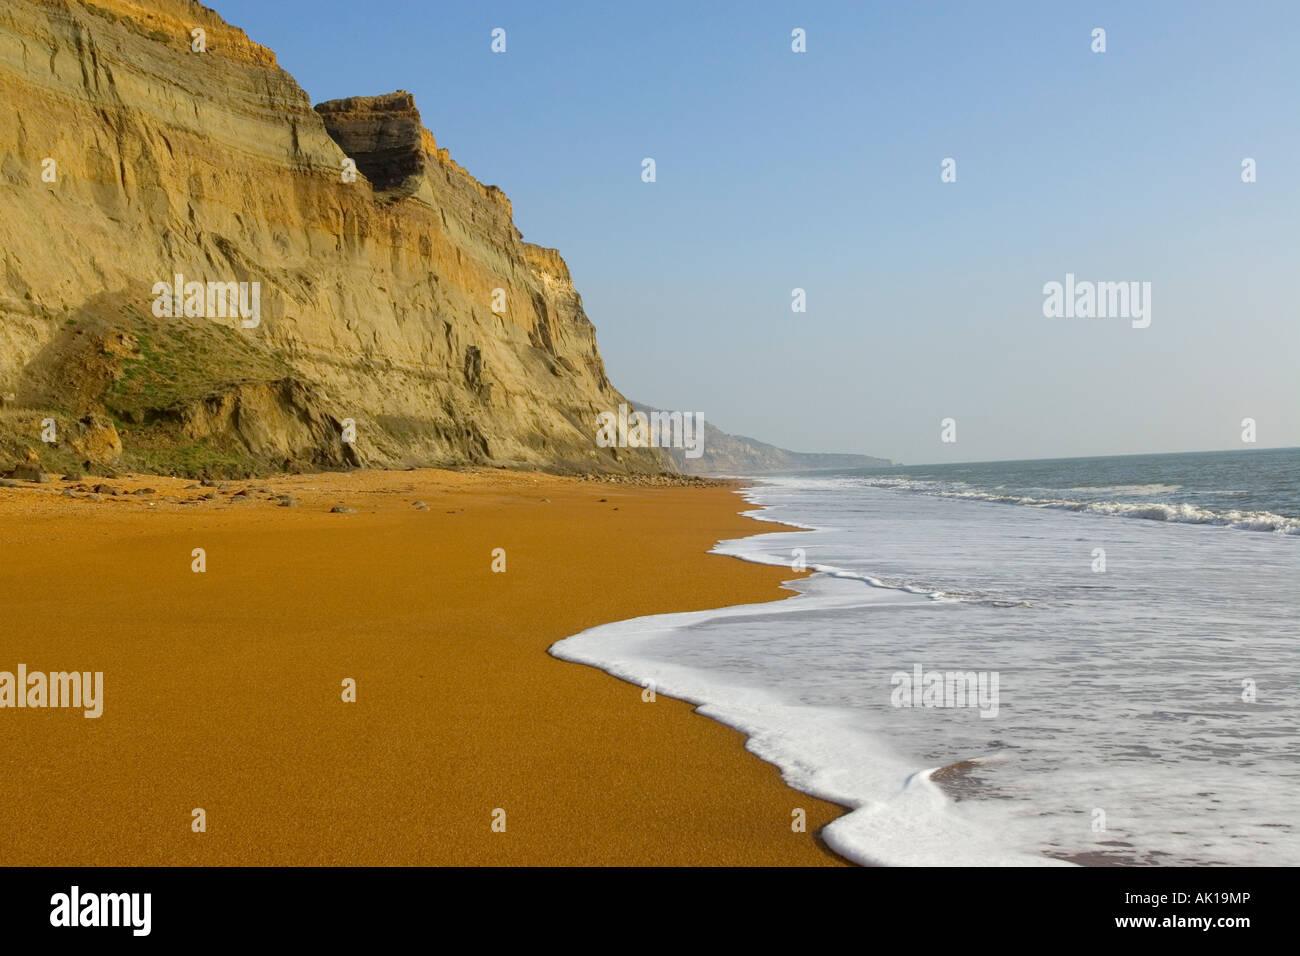 Chale Beach Isle of Wight England UK - Stock Image